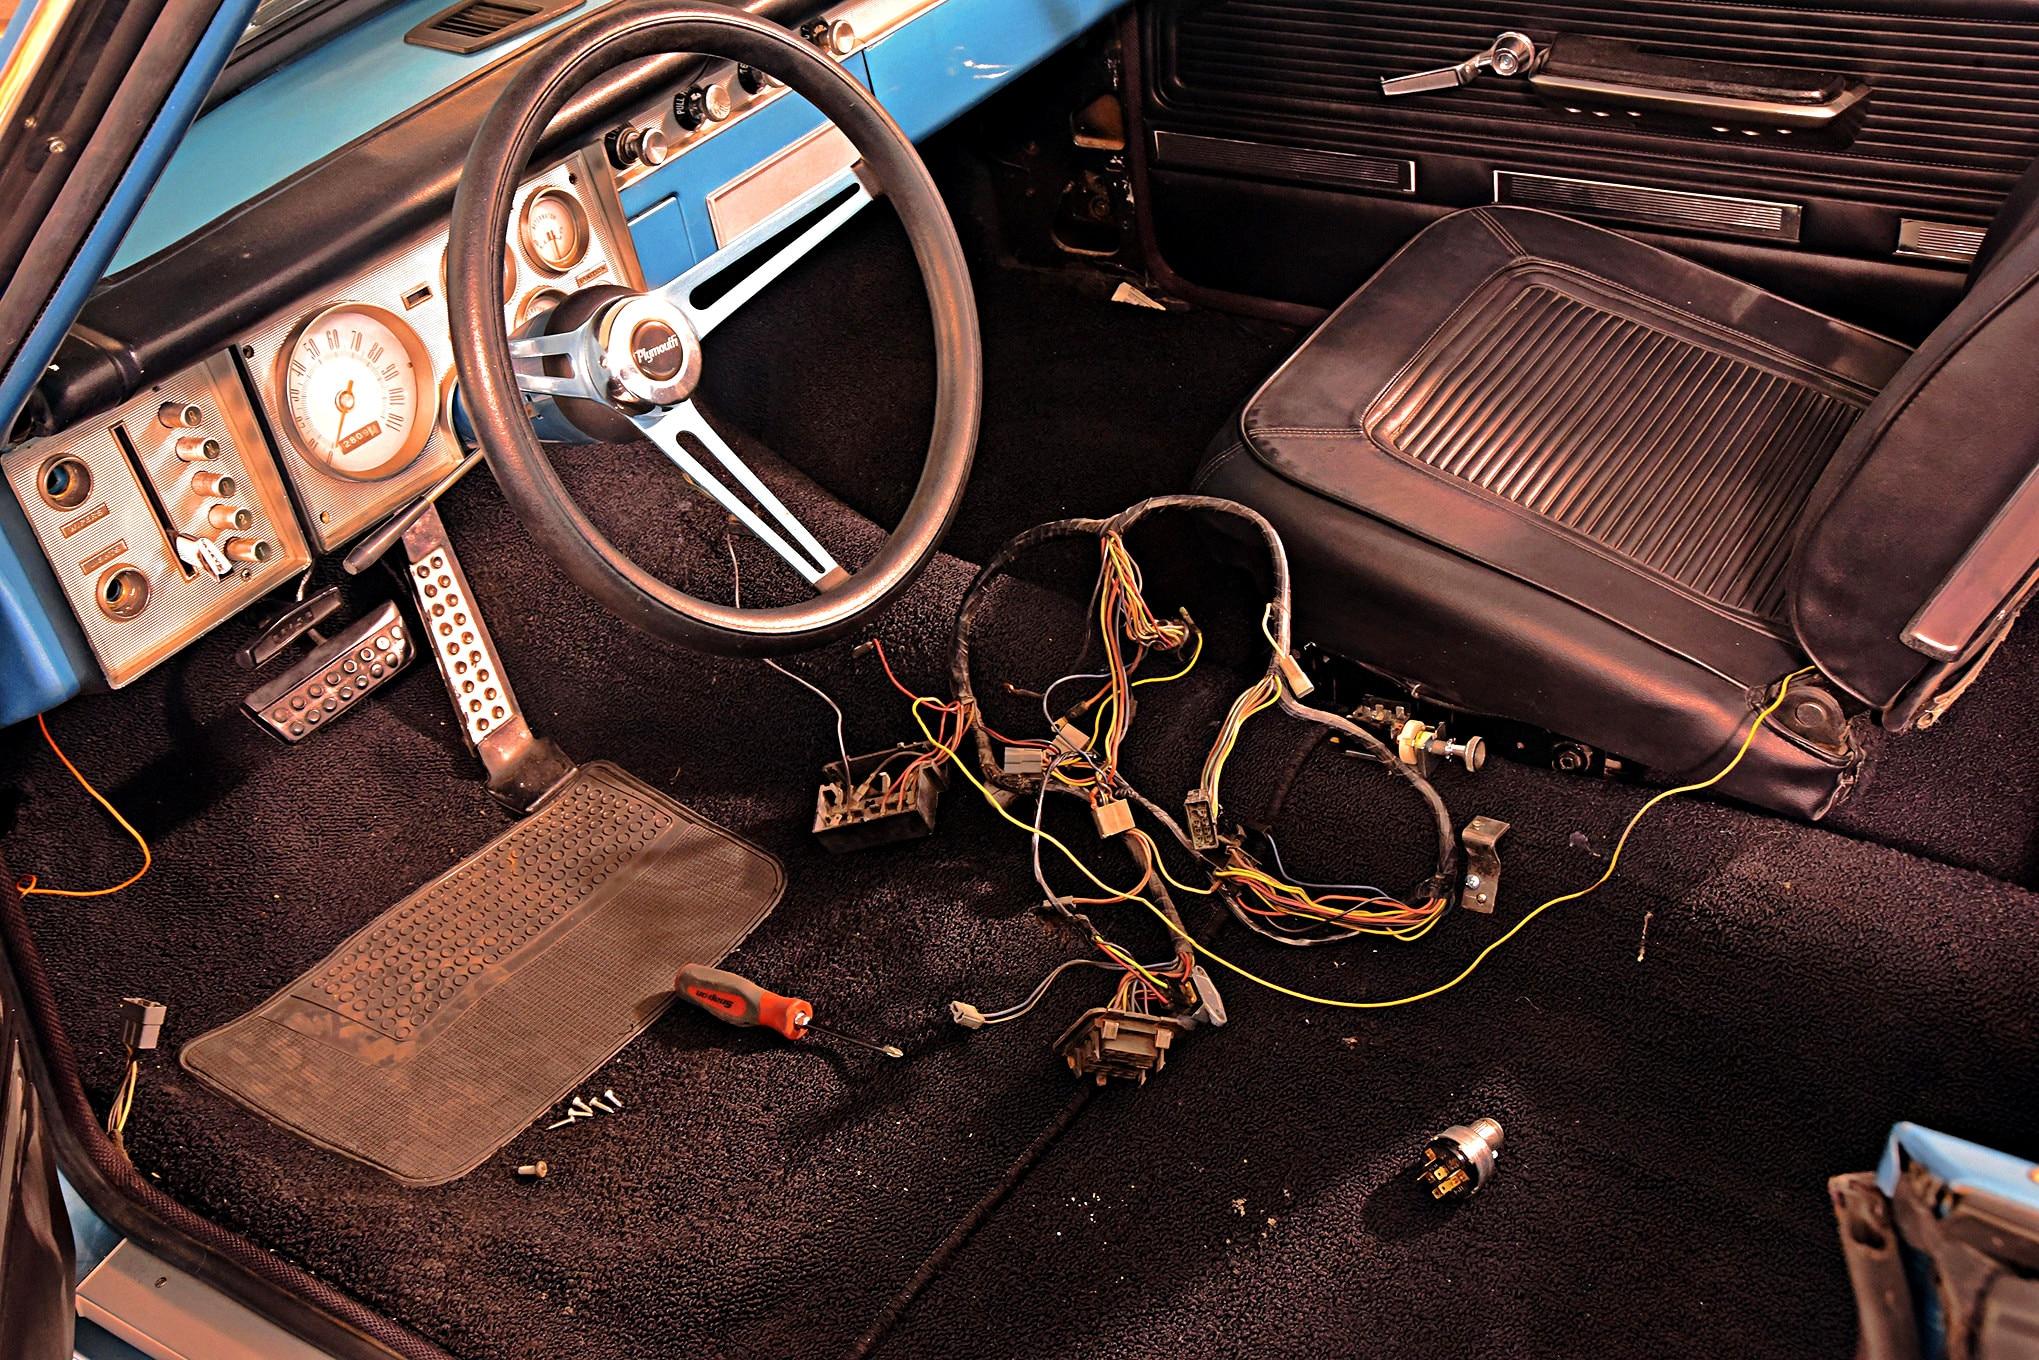 1965 barracuda wiring harness electrical wiring diagrams 65 plymouth barracuda 4 sale 1965 plymouth barracuda wiring [ 2039 x 1360 Pixel ]